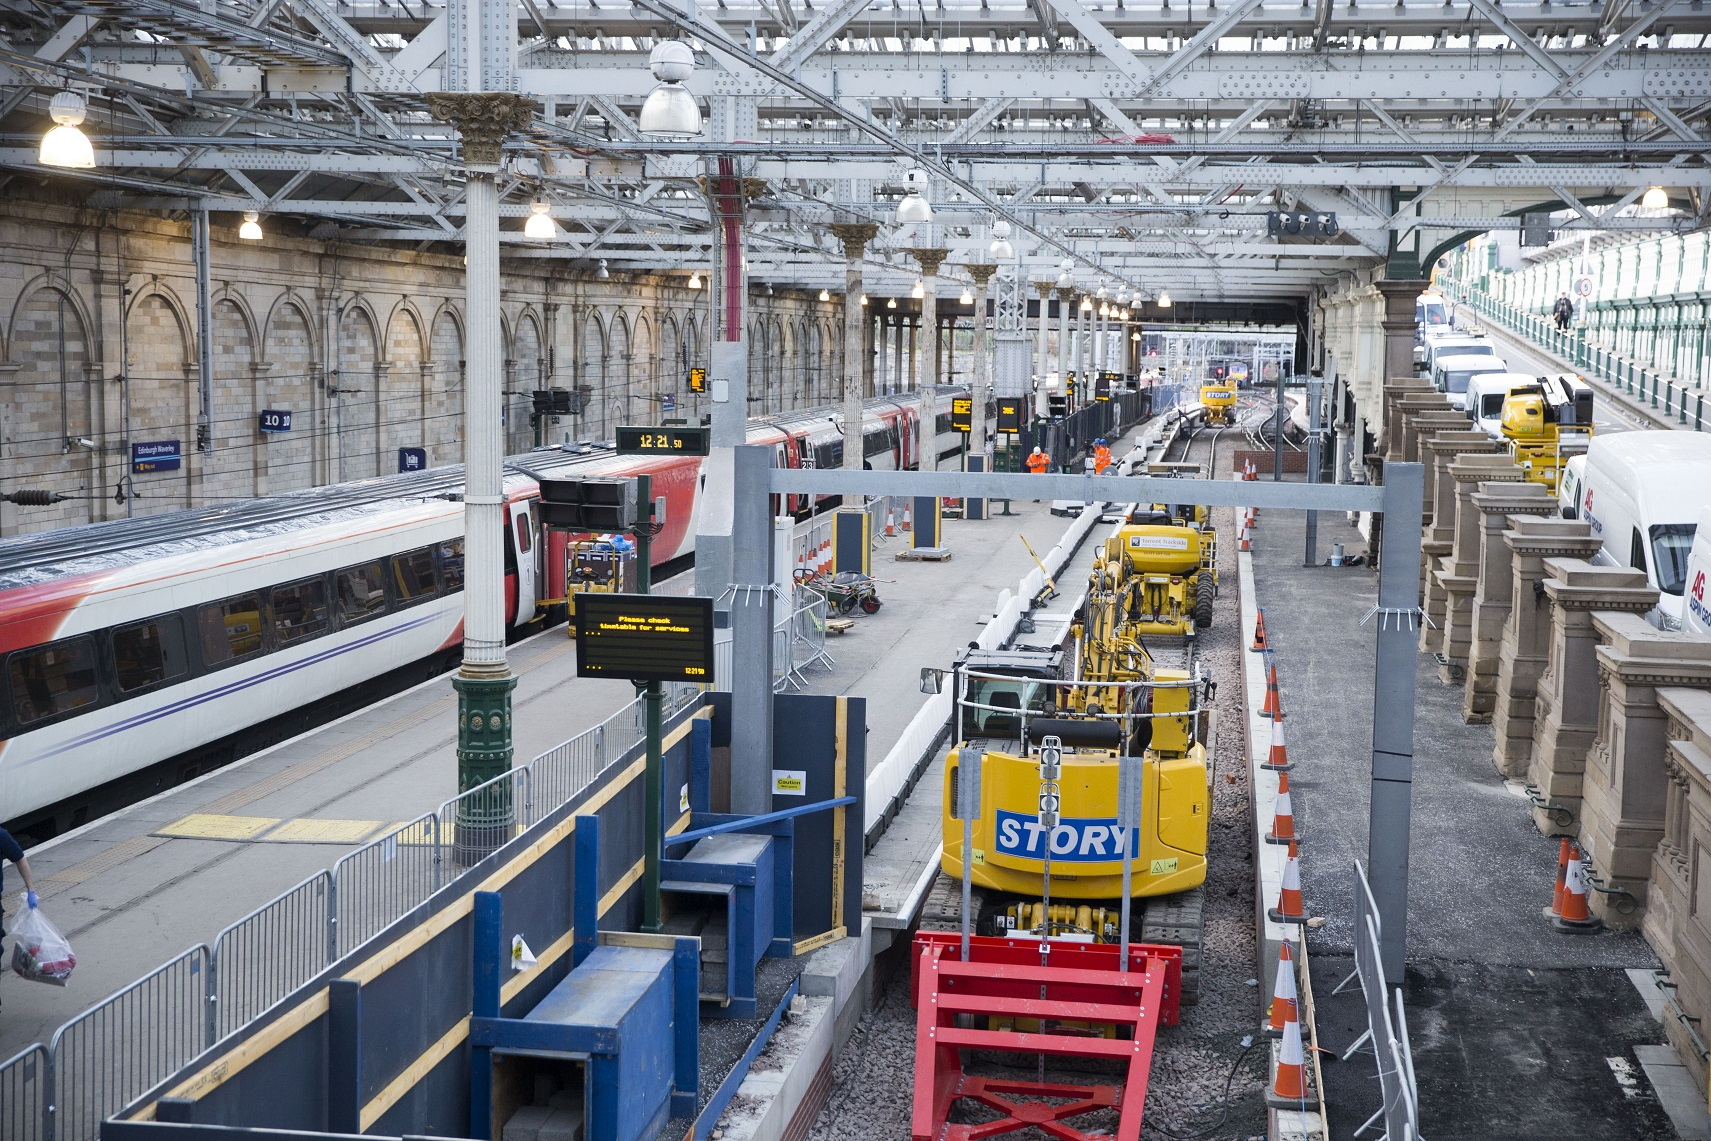 New Platform Arrives For Edinburgh Waverley Passengers